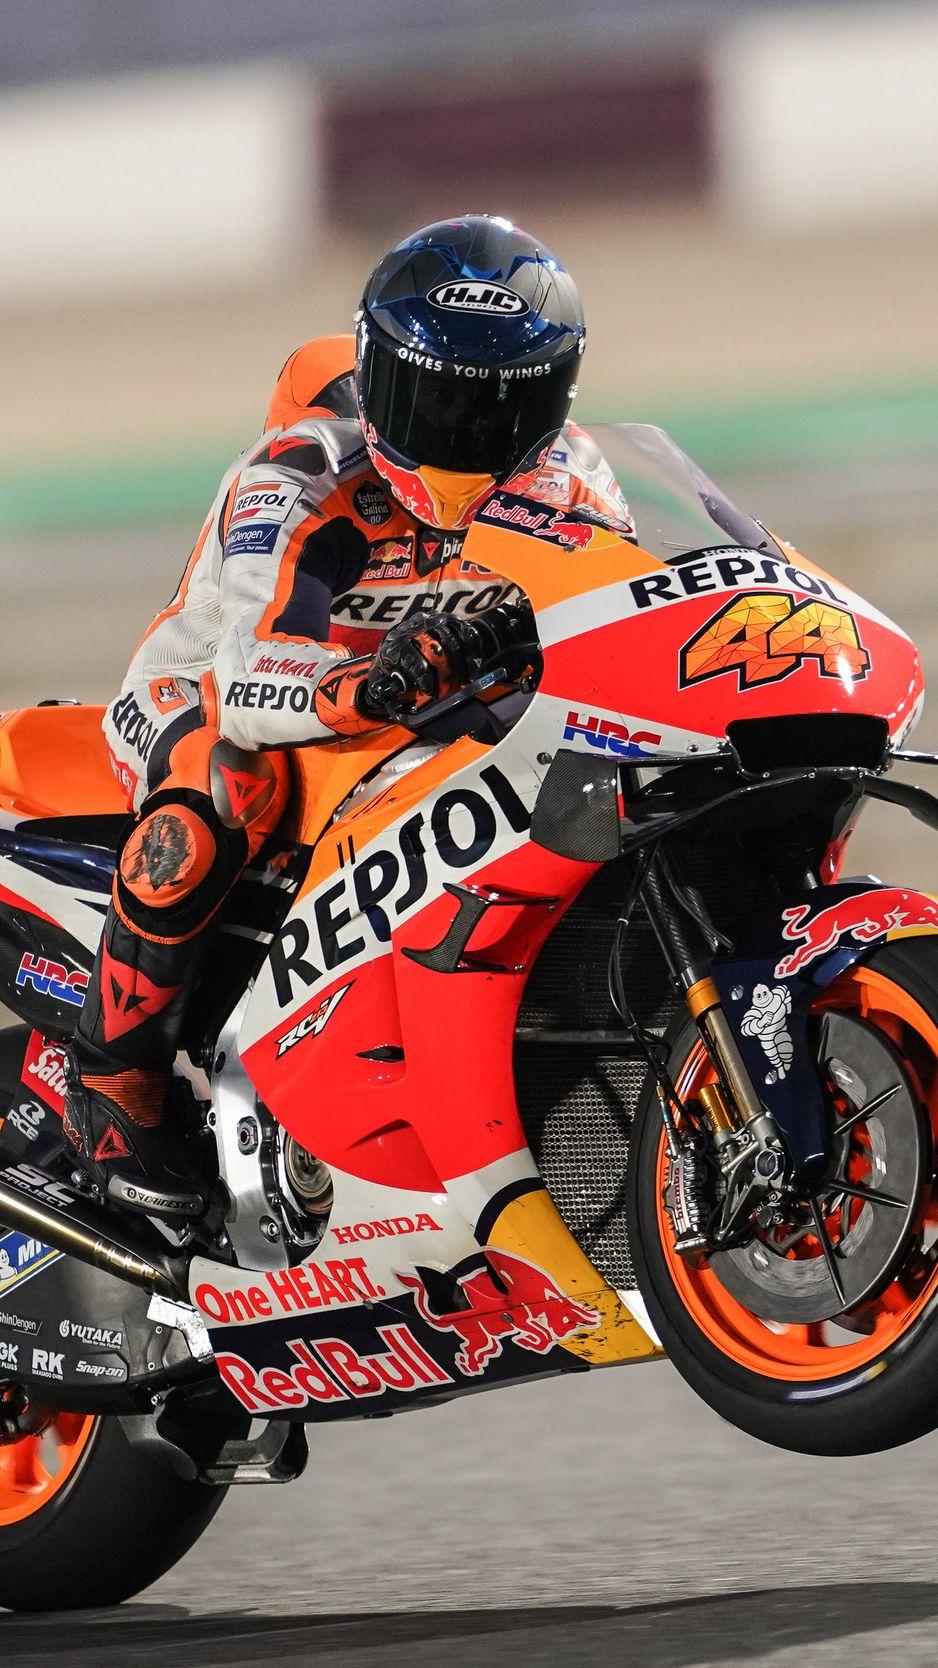 938x1668 Wallpaper honda, motorcycle, motorcyclist, helmet, speed, track, orange